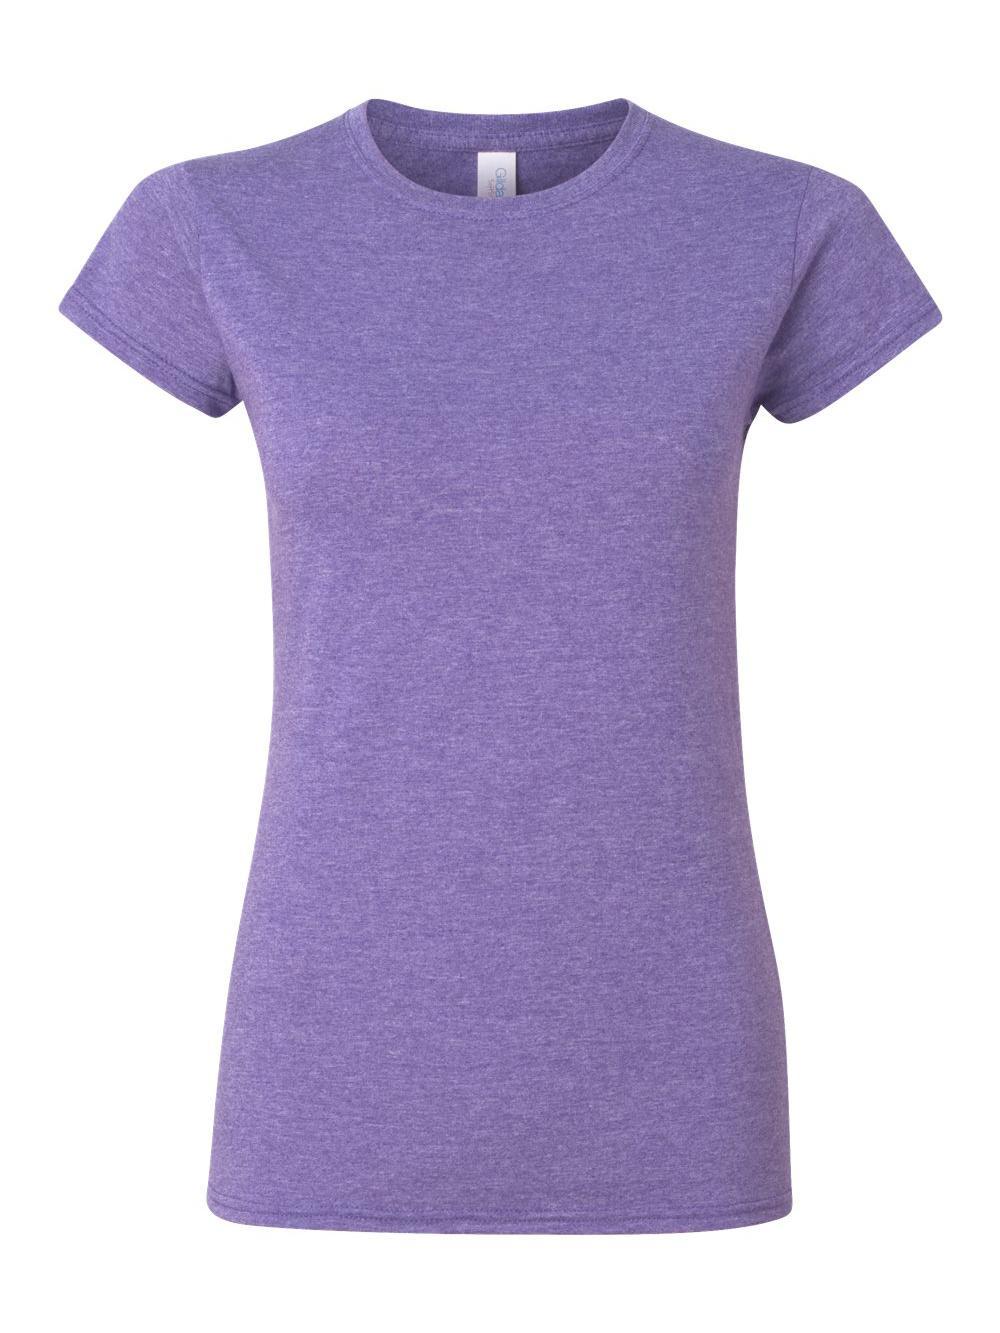 Gildan-Softstyle-Women-039-s-T-Shirt-64000L thumbnail 24